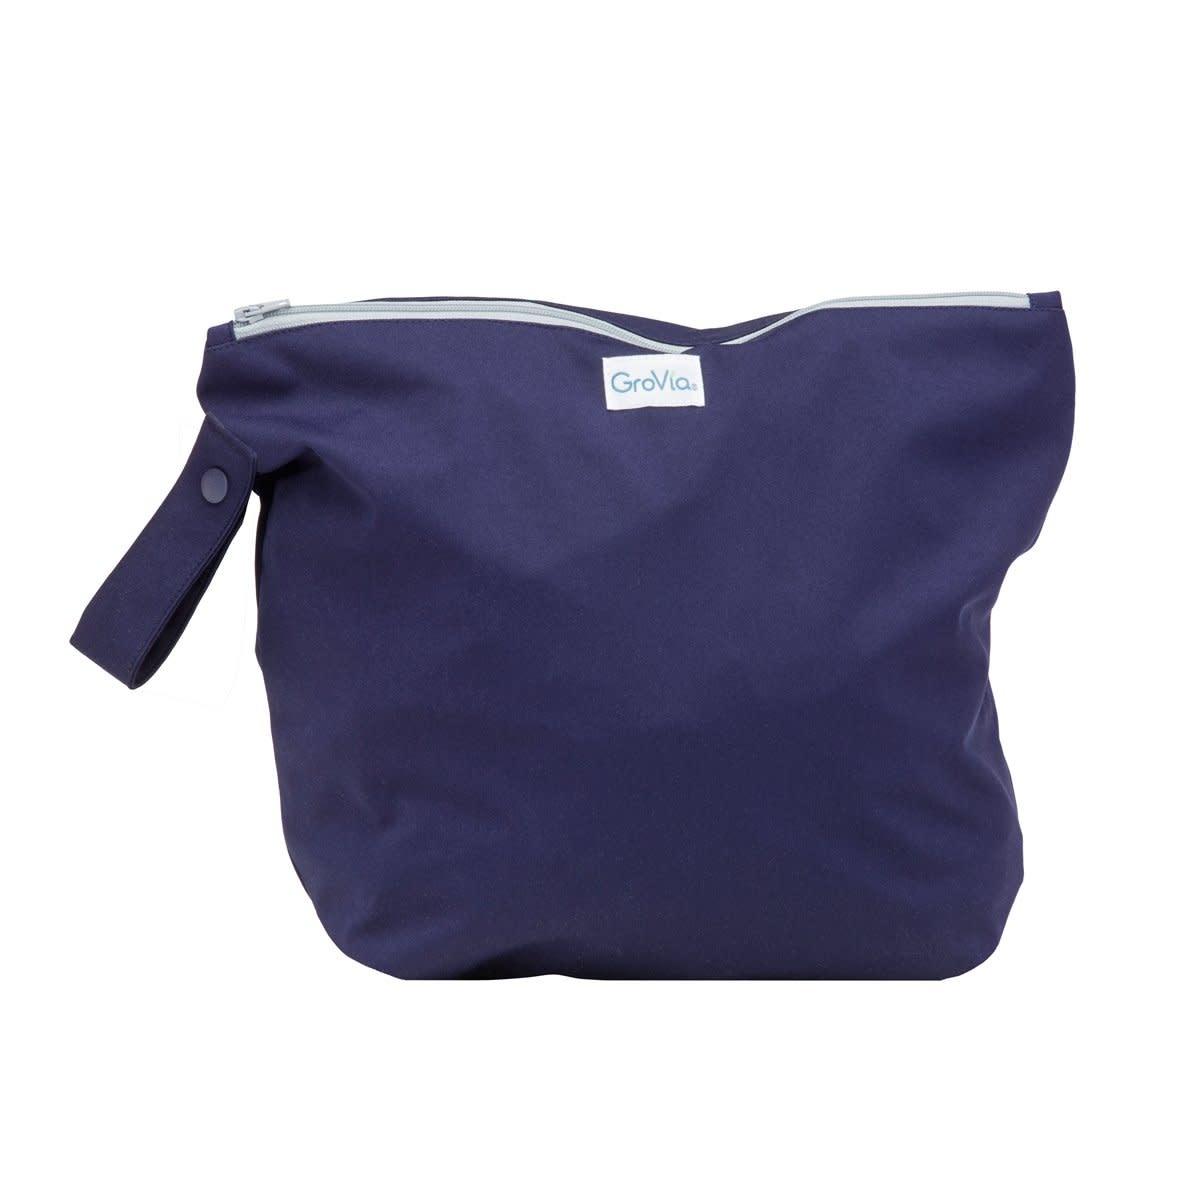 GroVia Zippered Wet Bag Arctic